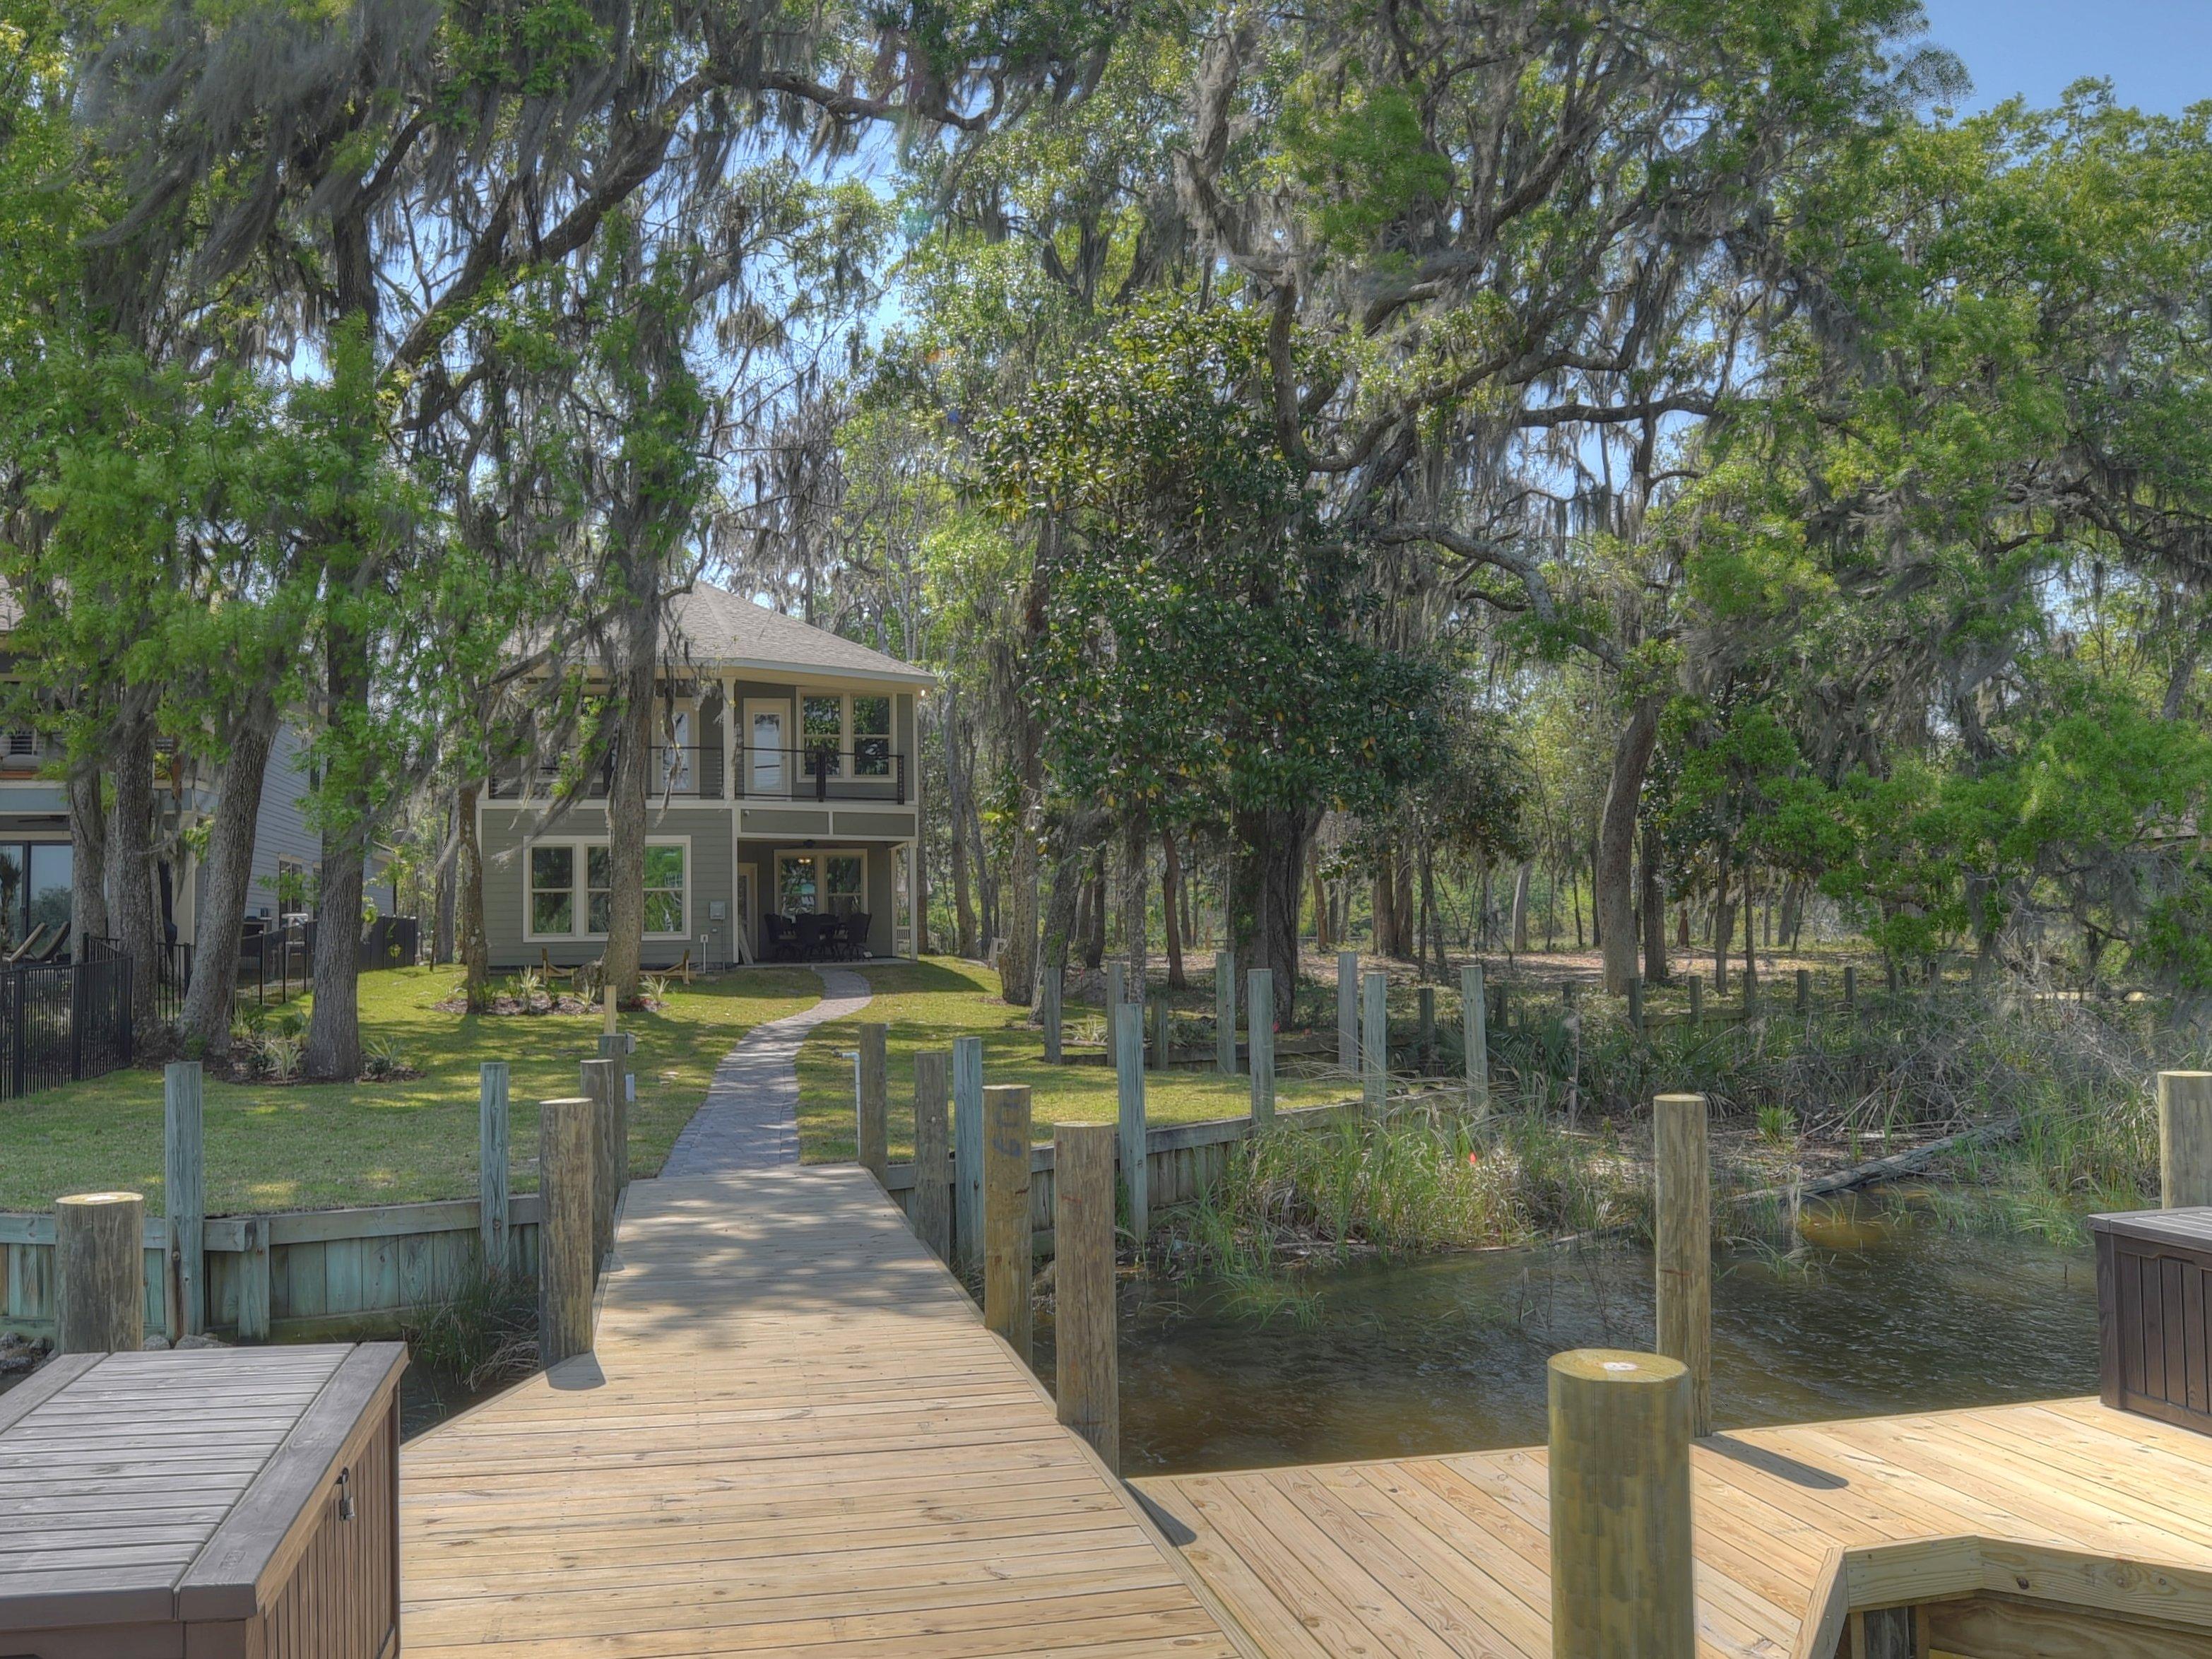 93 Beacon Point Condo rental in Sandestin Rentals ~ Cottages and Villas  in Destin Florida - #5